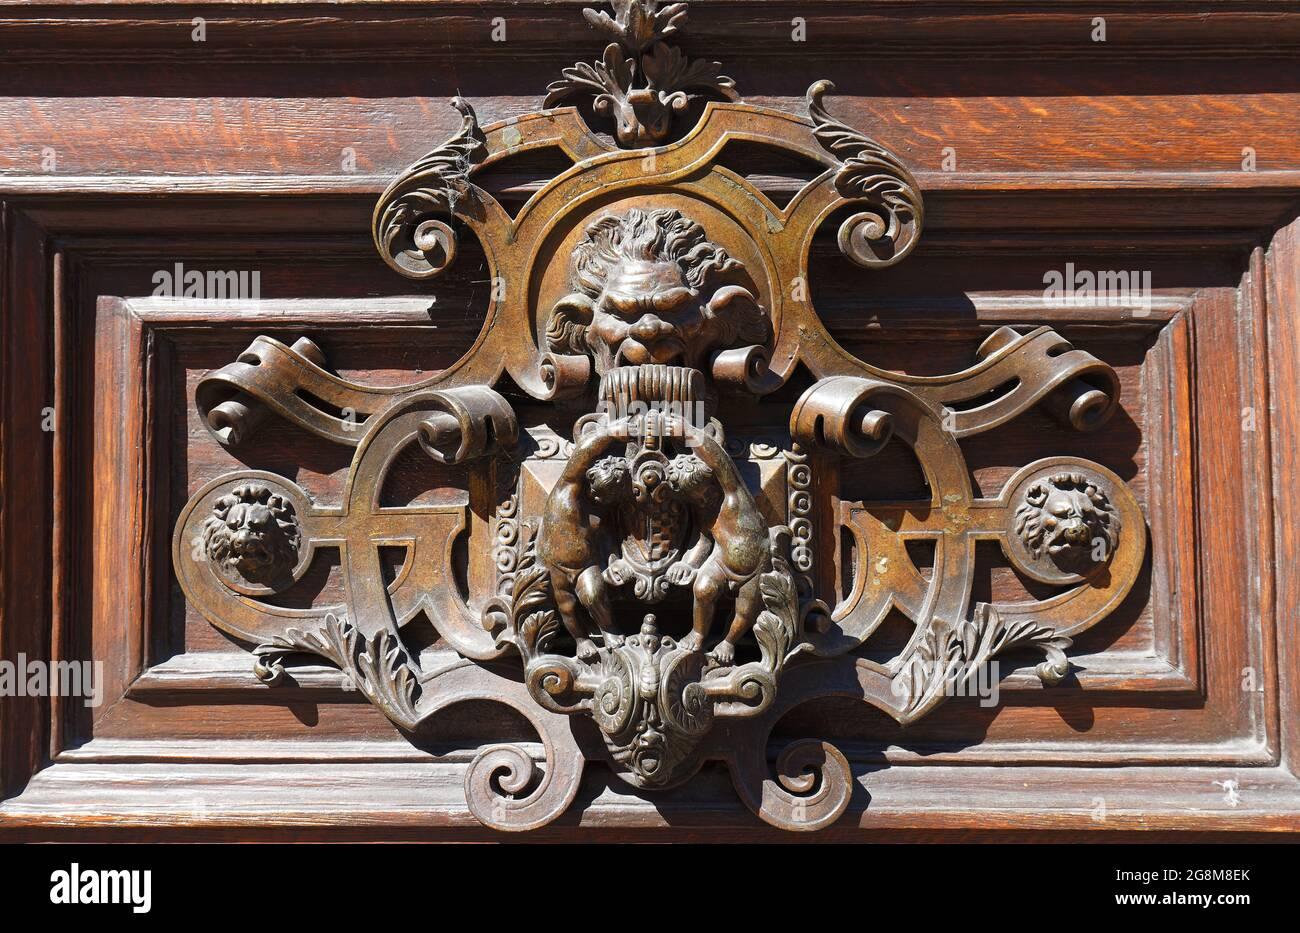 European Vintage old metal wrought iron door knocker. Design detail. Paris. Stock Photo